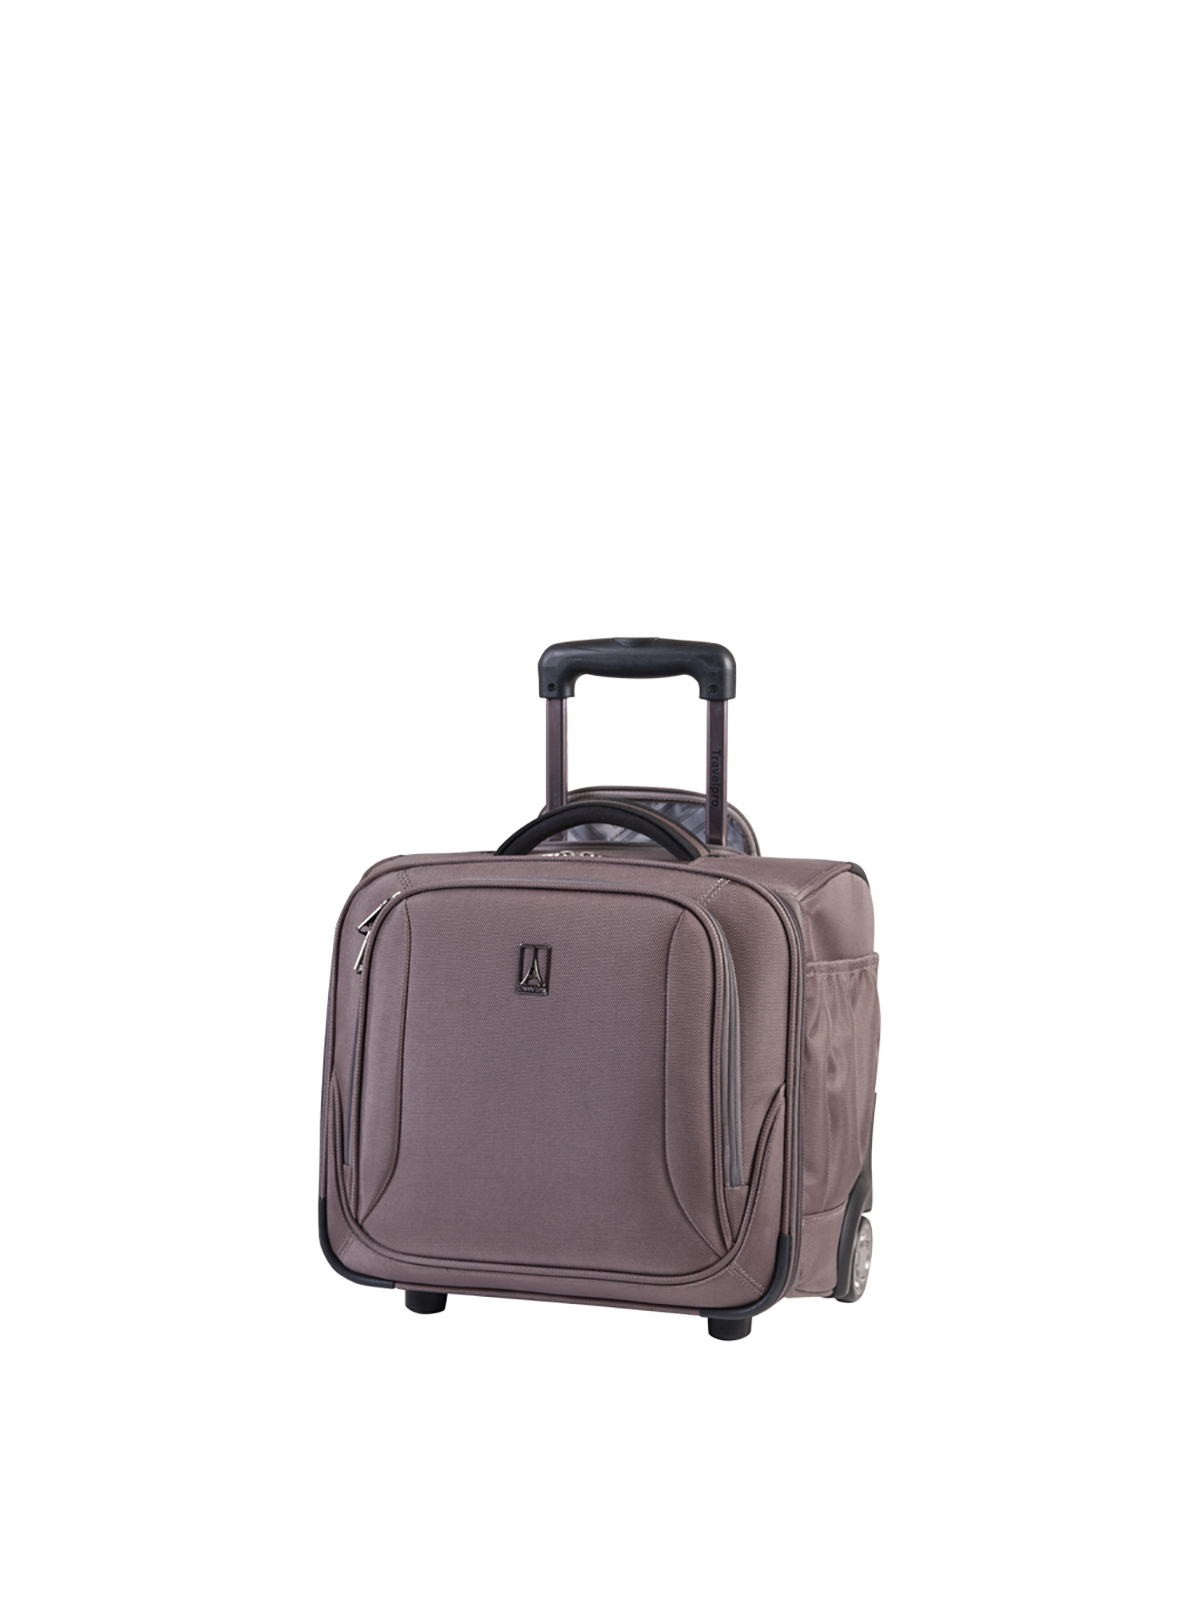 tm9 tm99 - Travel Pro Luggage